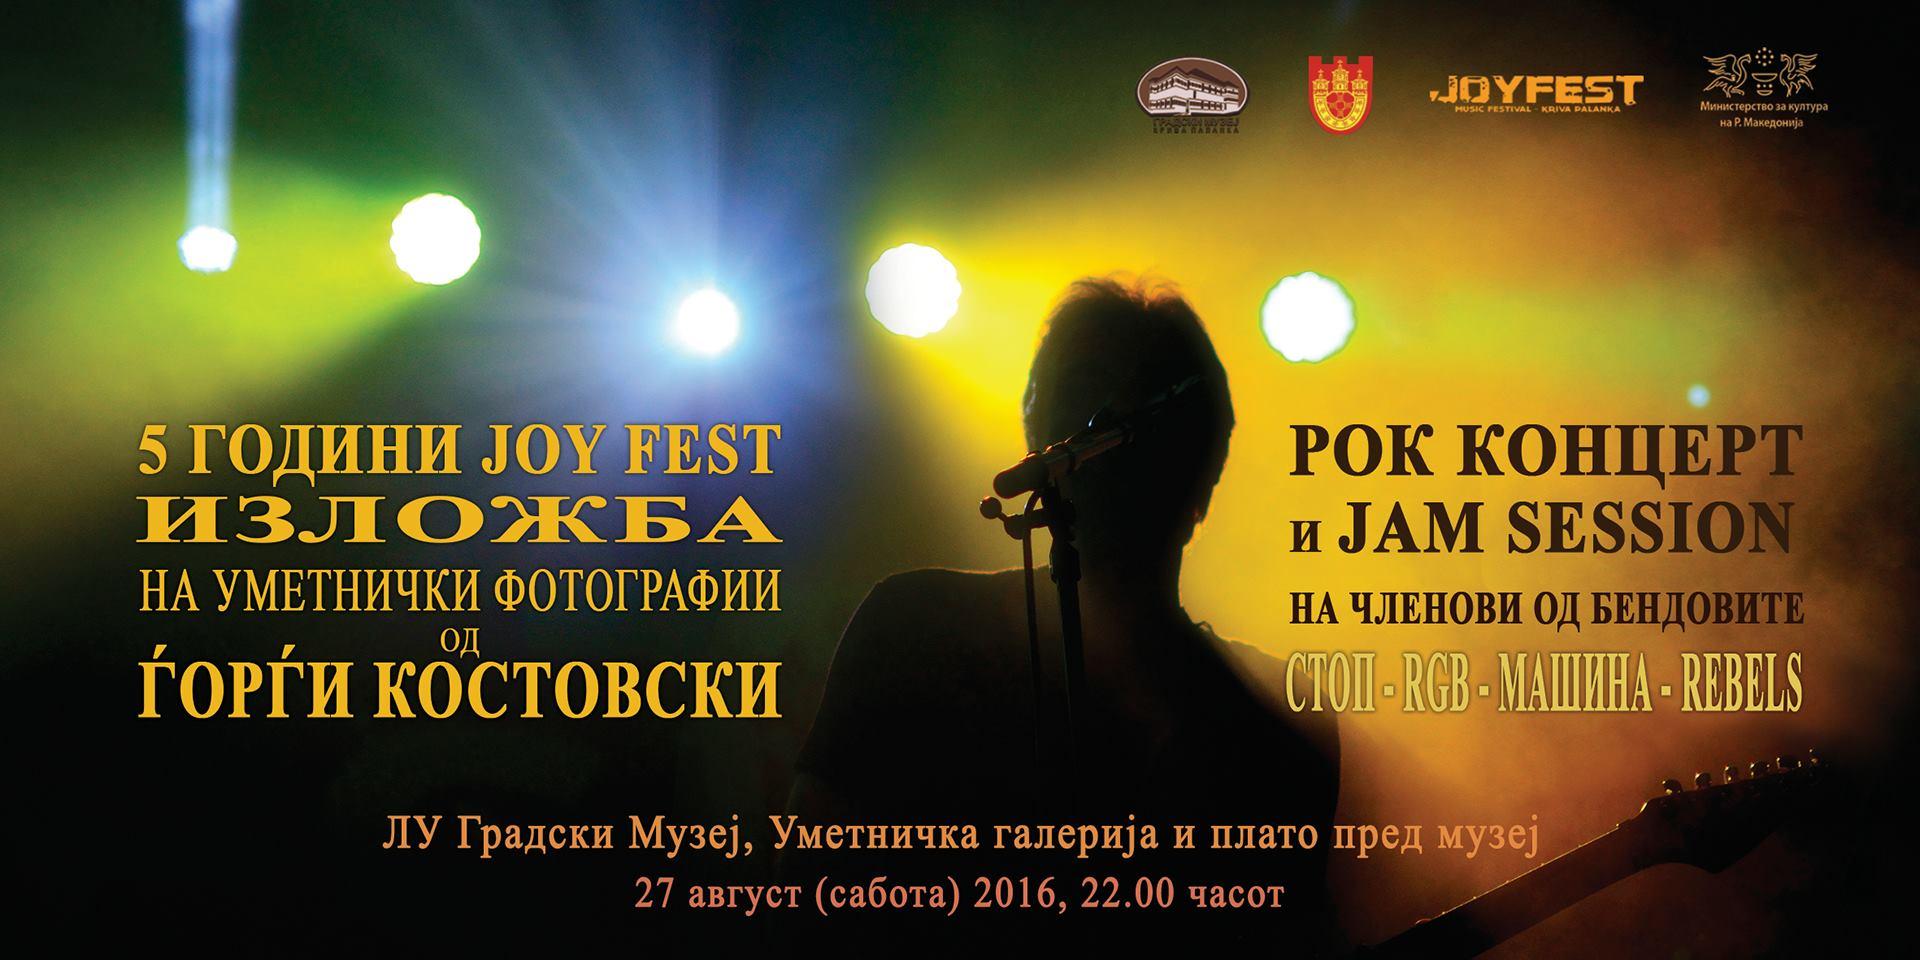 Izlozba_5_godini_Joy Fest